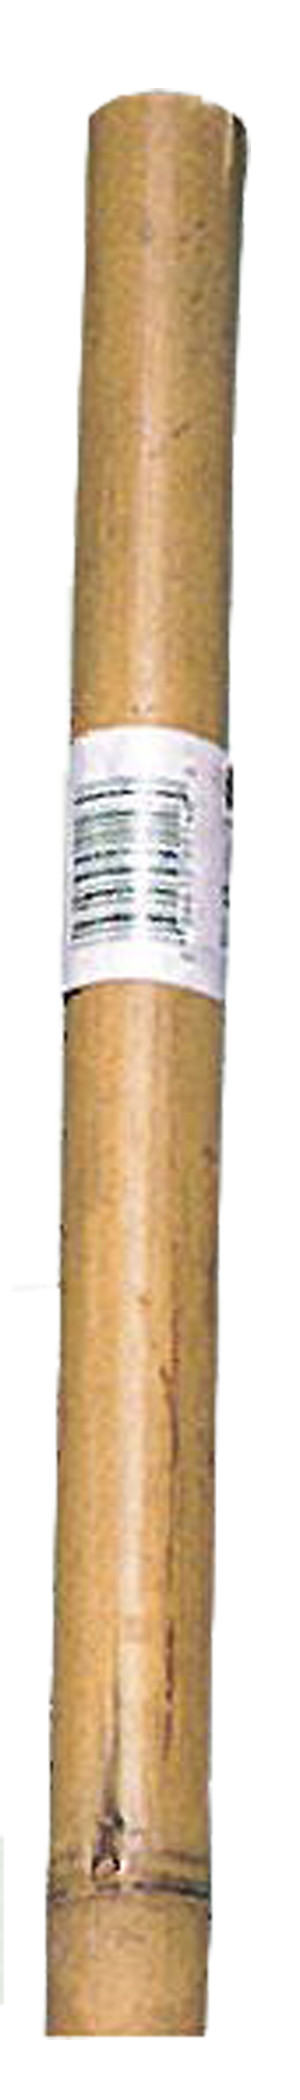 Bond Super Bamboo Pole Brown 25ea/5Ftx1 in